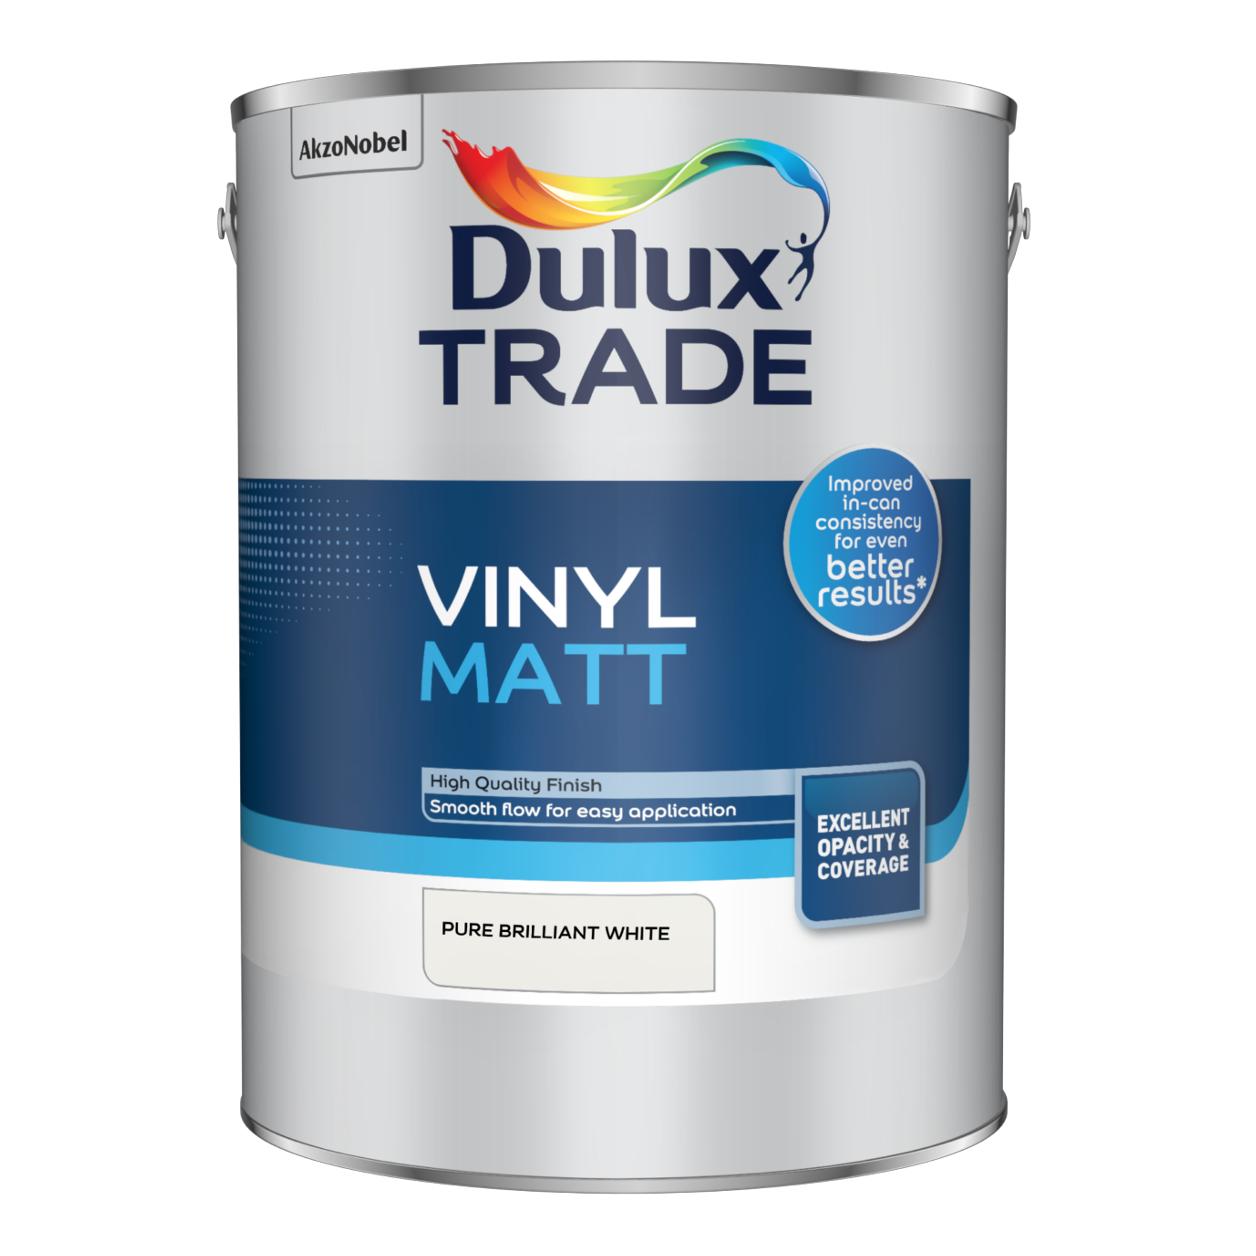 Dulux trade vinyl matt pure brilliant white or magnolia 7.5 Litre at Dulux Shop £33.89 delivered / £26.39 C&C